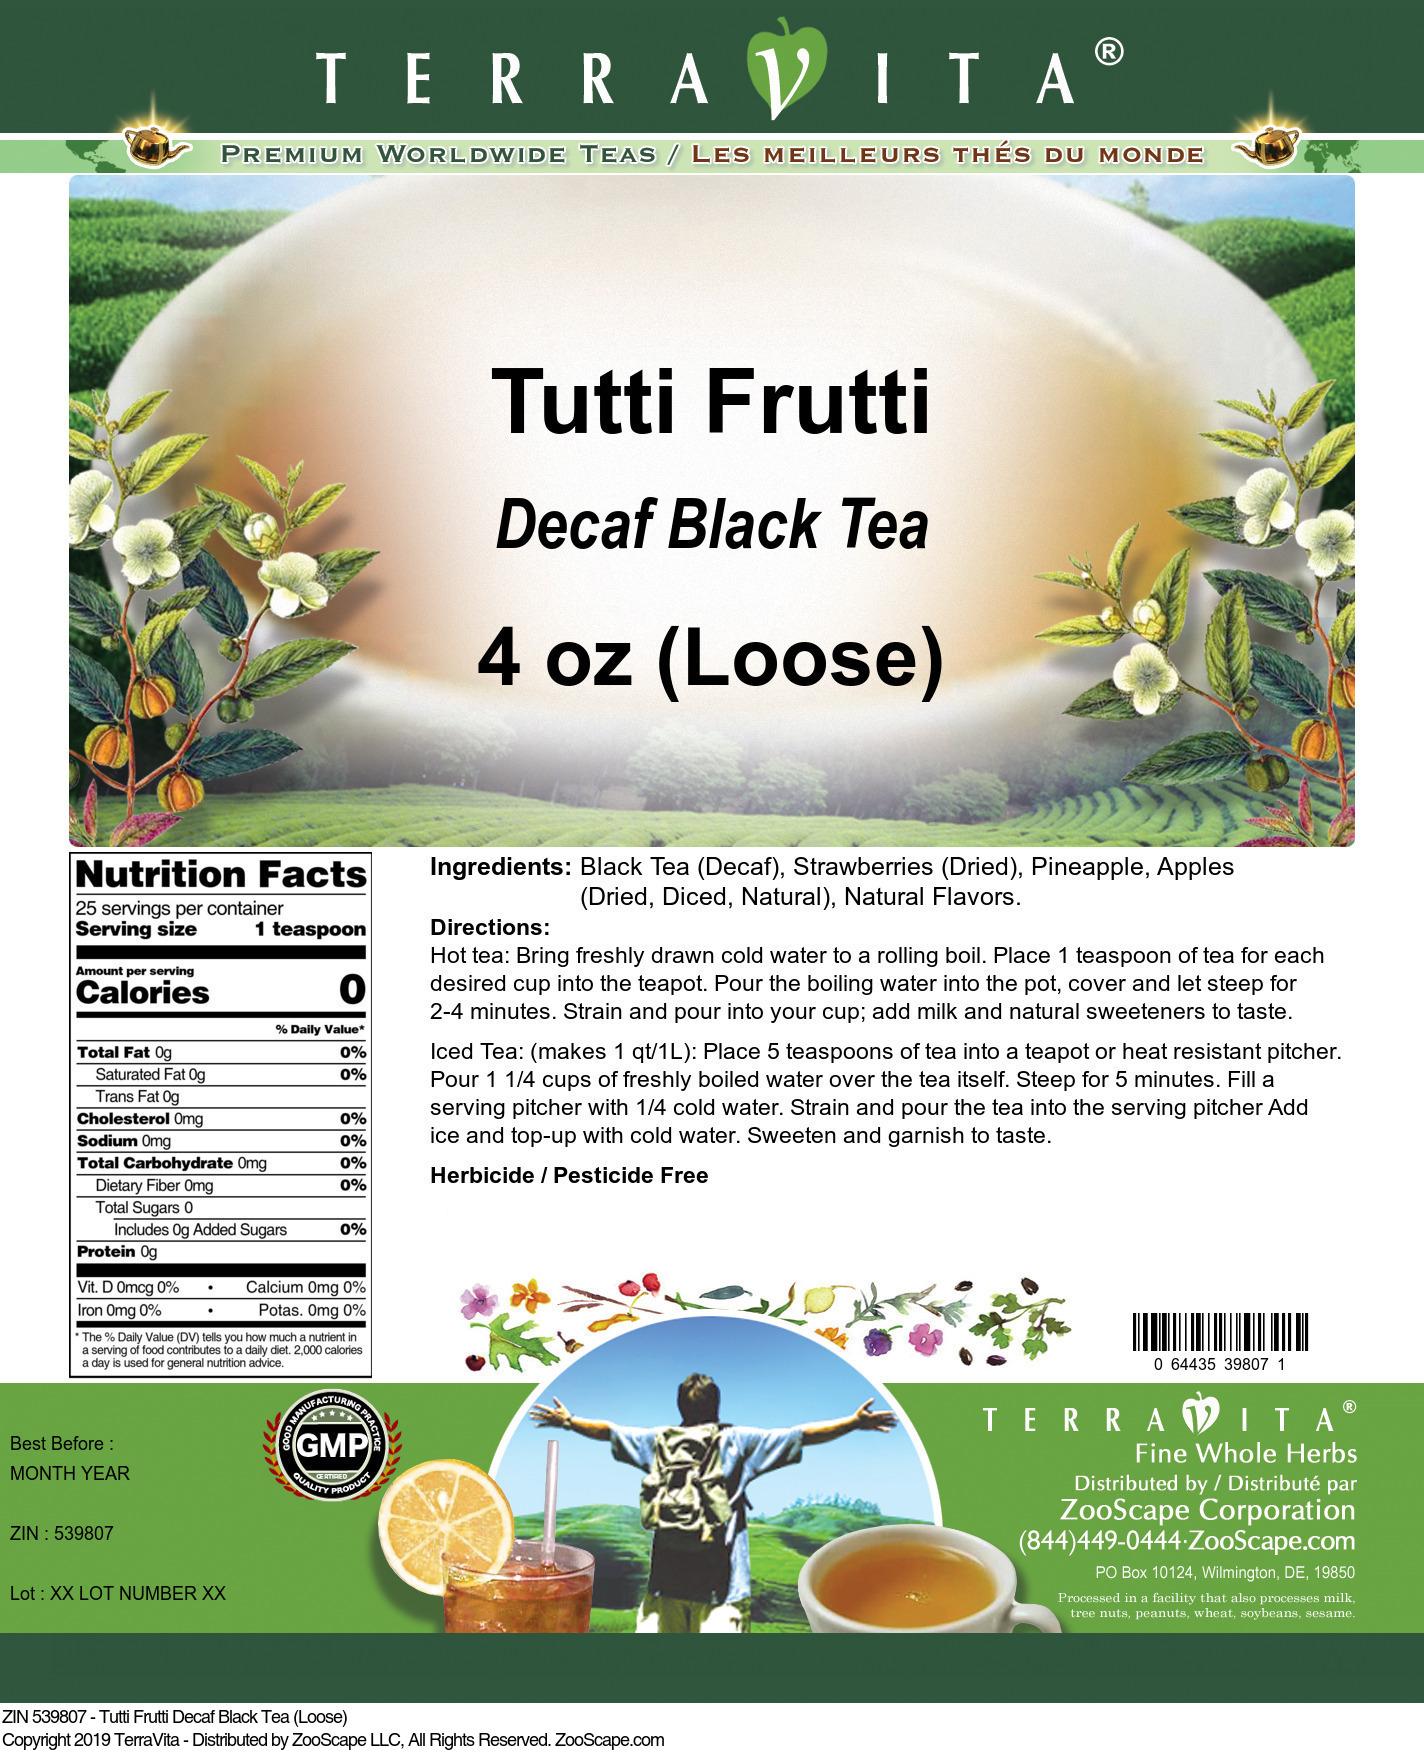 Tutti Frutti Decaf Black Tea (Loose)